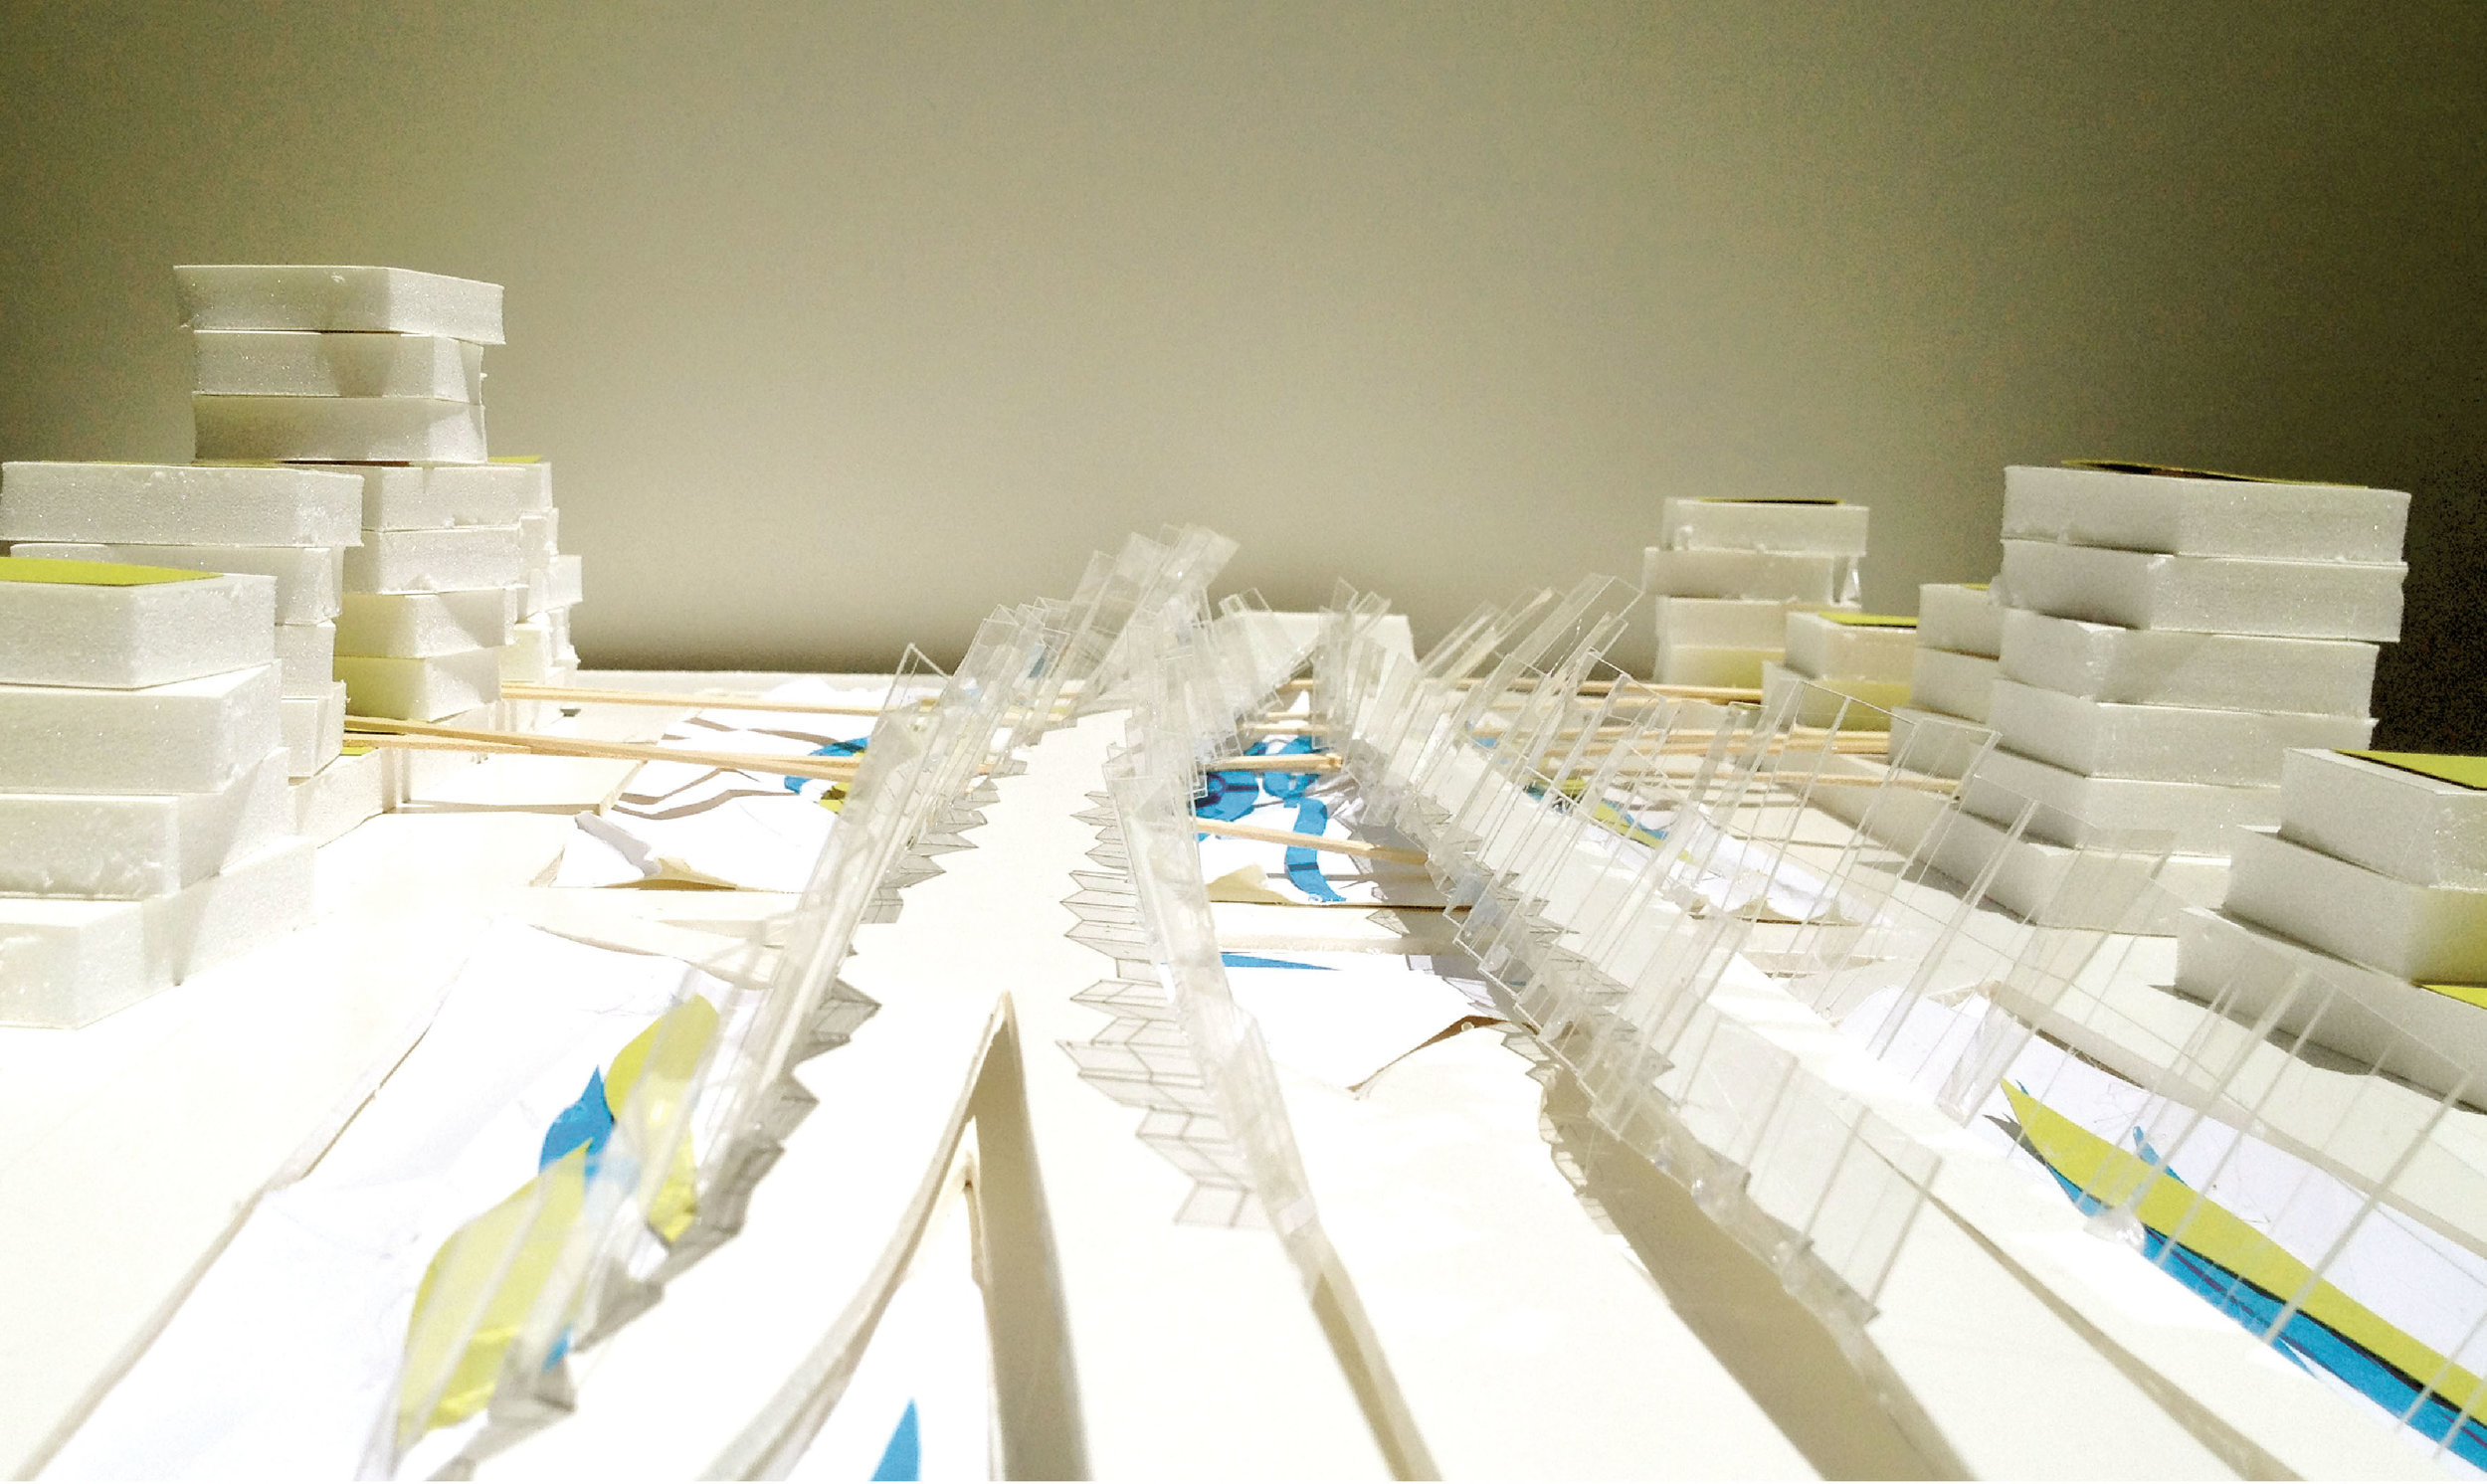 TINA CHEE_landscape studio_conveyance fwy.jpg